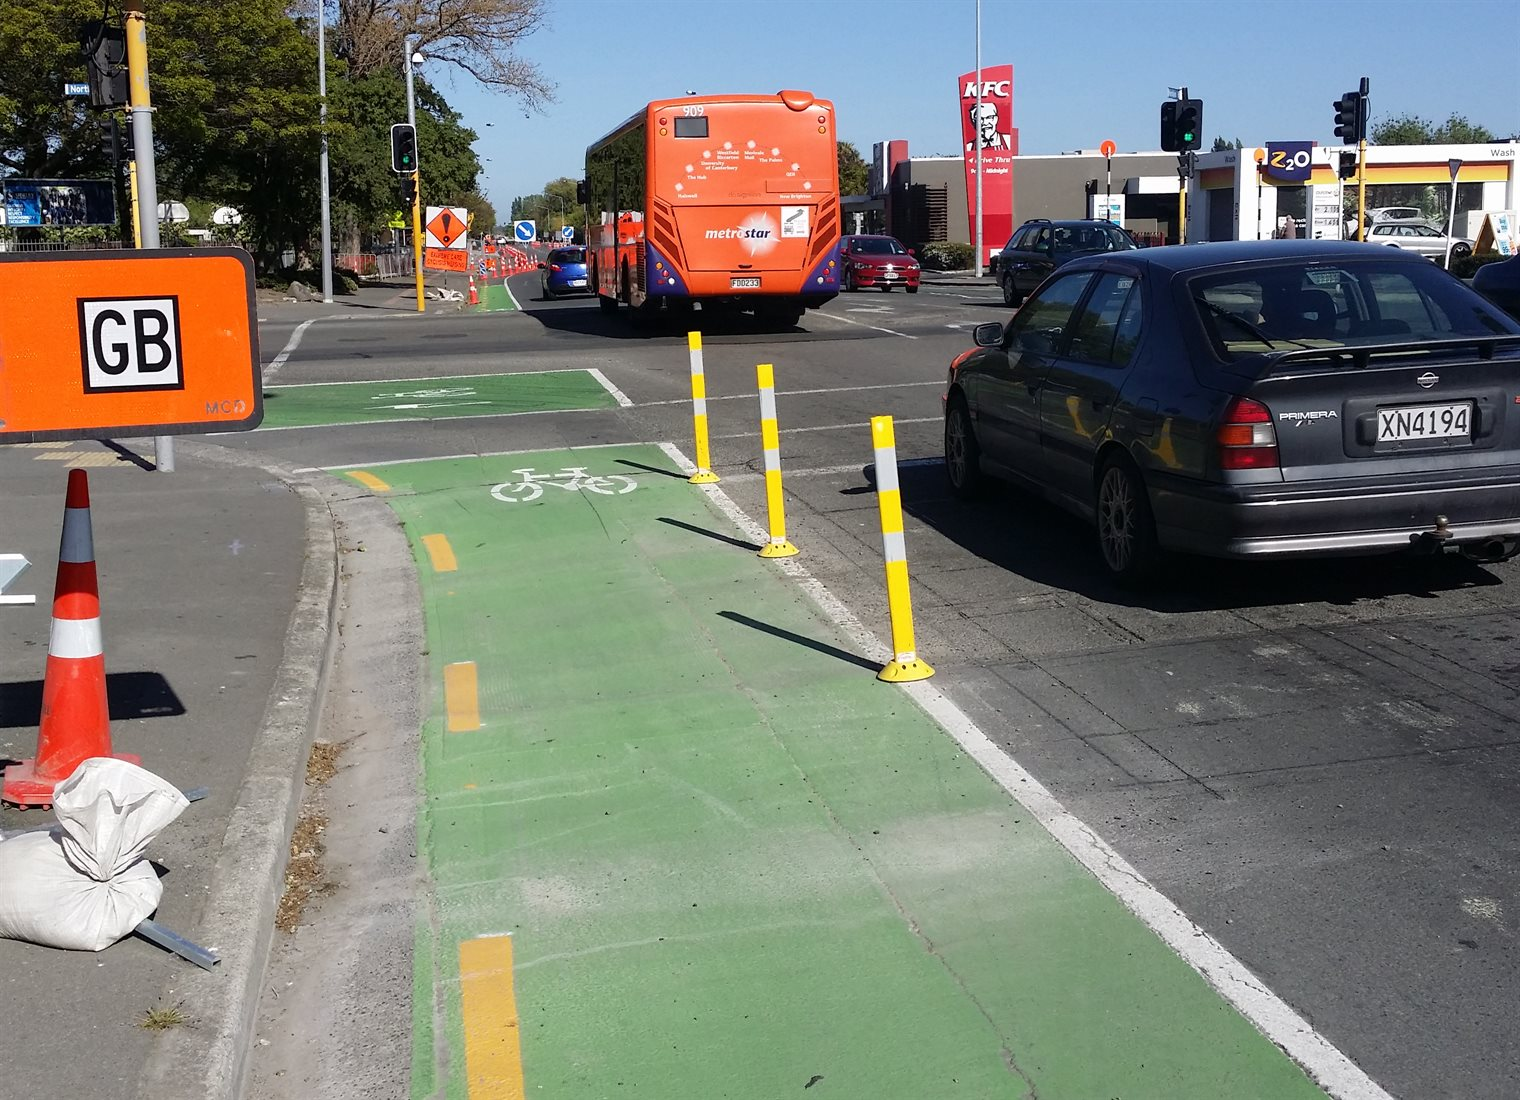 More cycle lane separators popping up